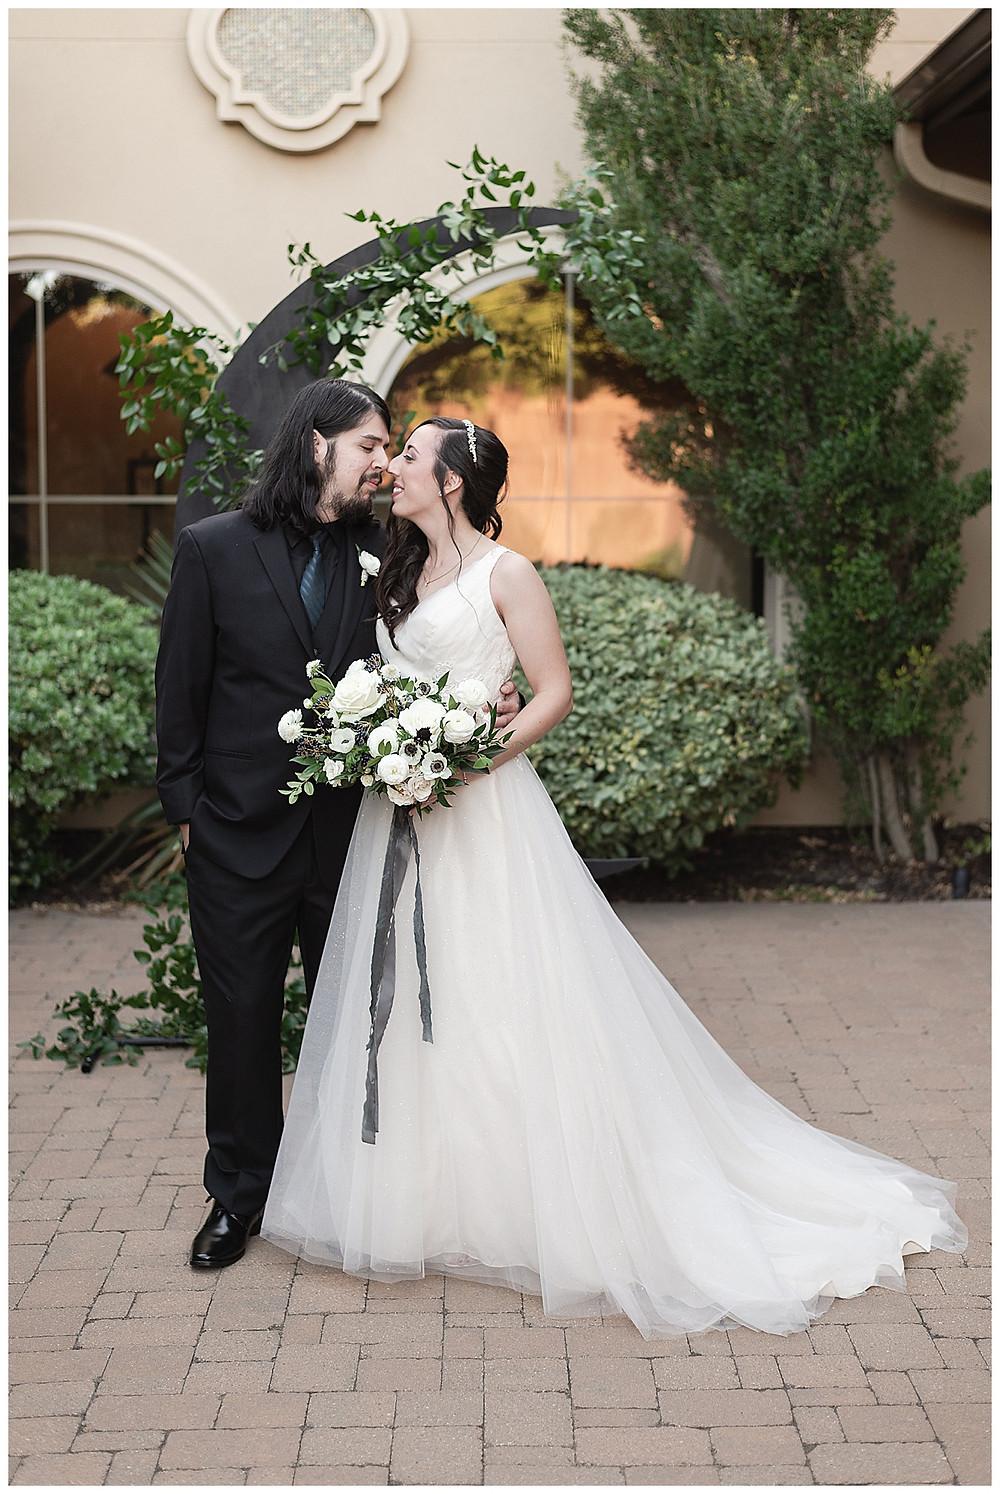 Chapel Ana Villa, The colony Texas, dallas wedding, dallas wedding photography, dallas wedding venue bride and groom first look, moon greenery install